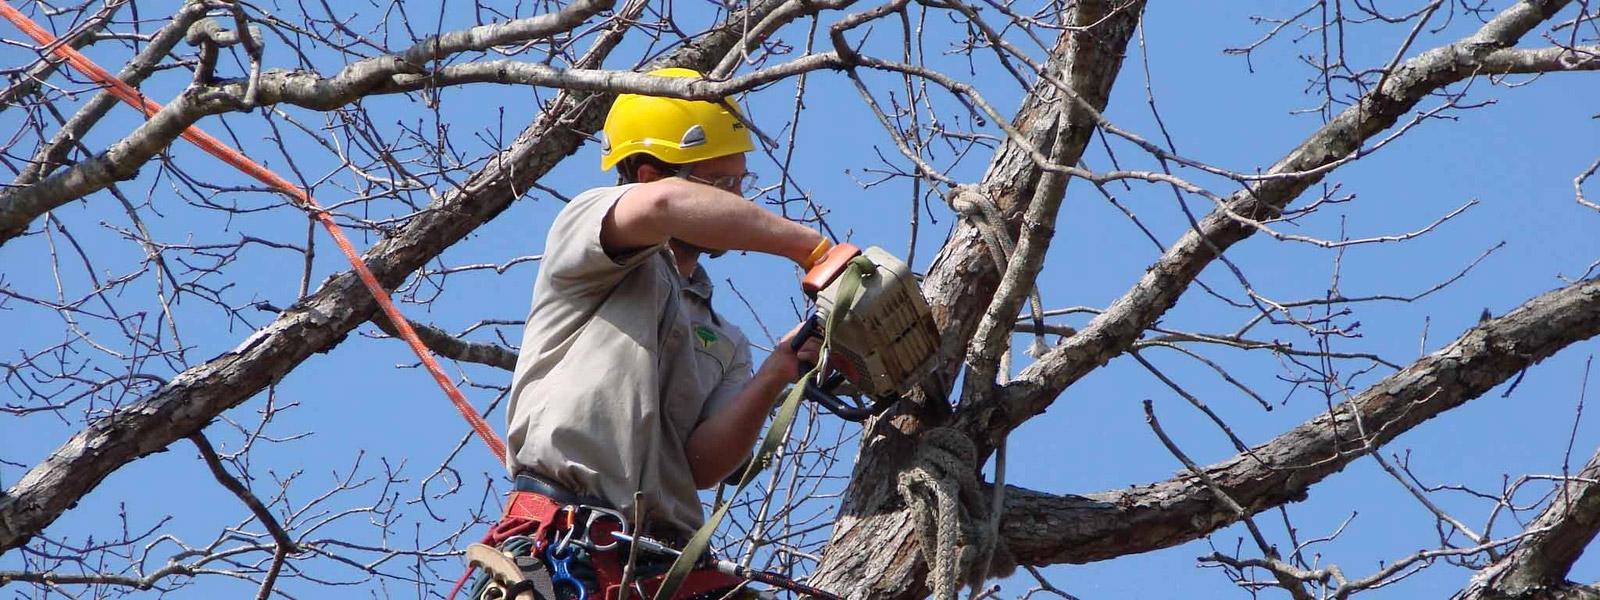 Tree Service Sunshine coast (@skylinetreess) Cover Image